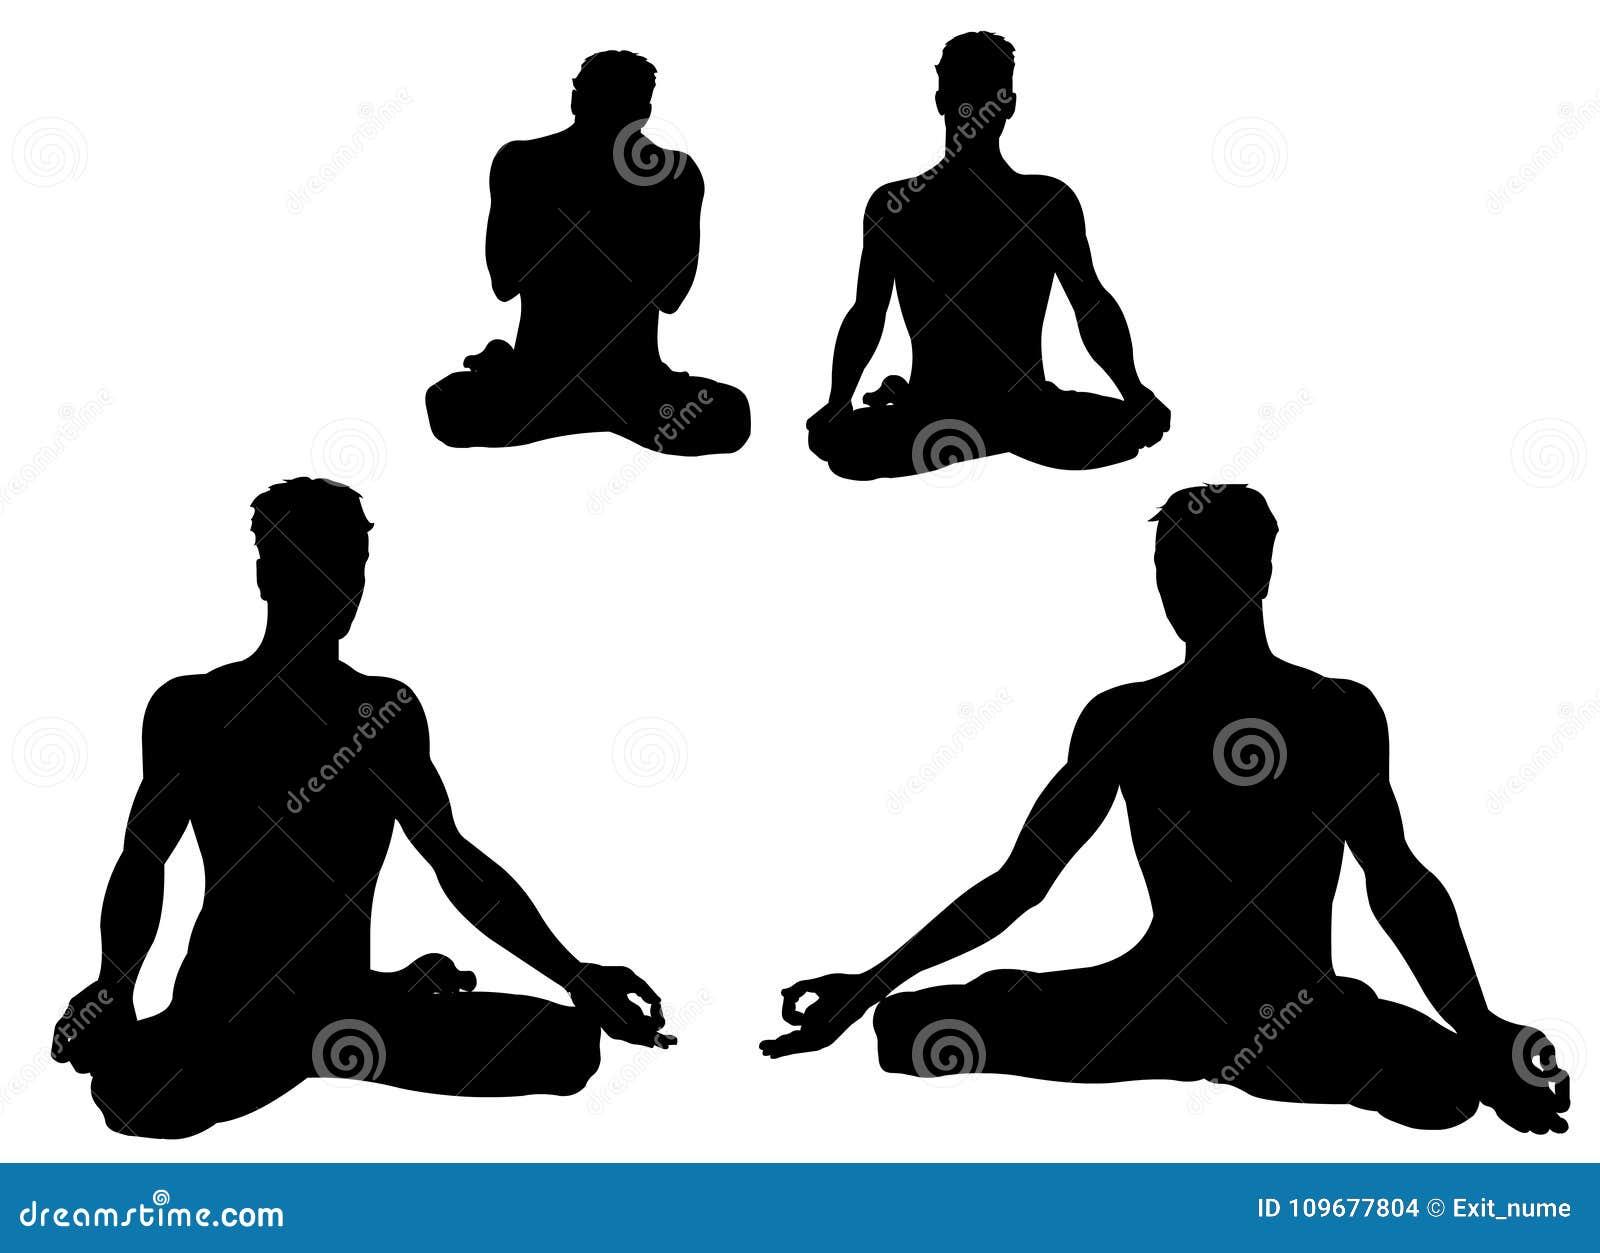 A Set Of Asanas Poses Yoga Yogi Man Silhouette Representing Strenght Flexibility Empowerment Through